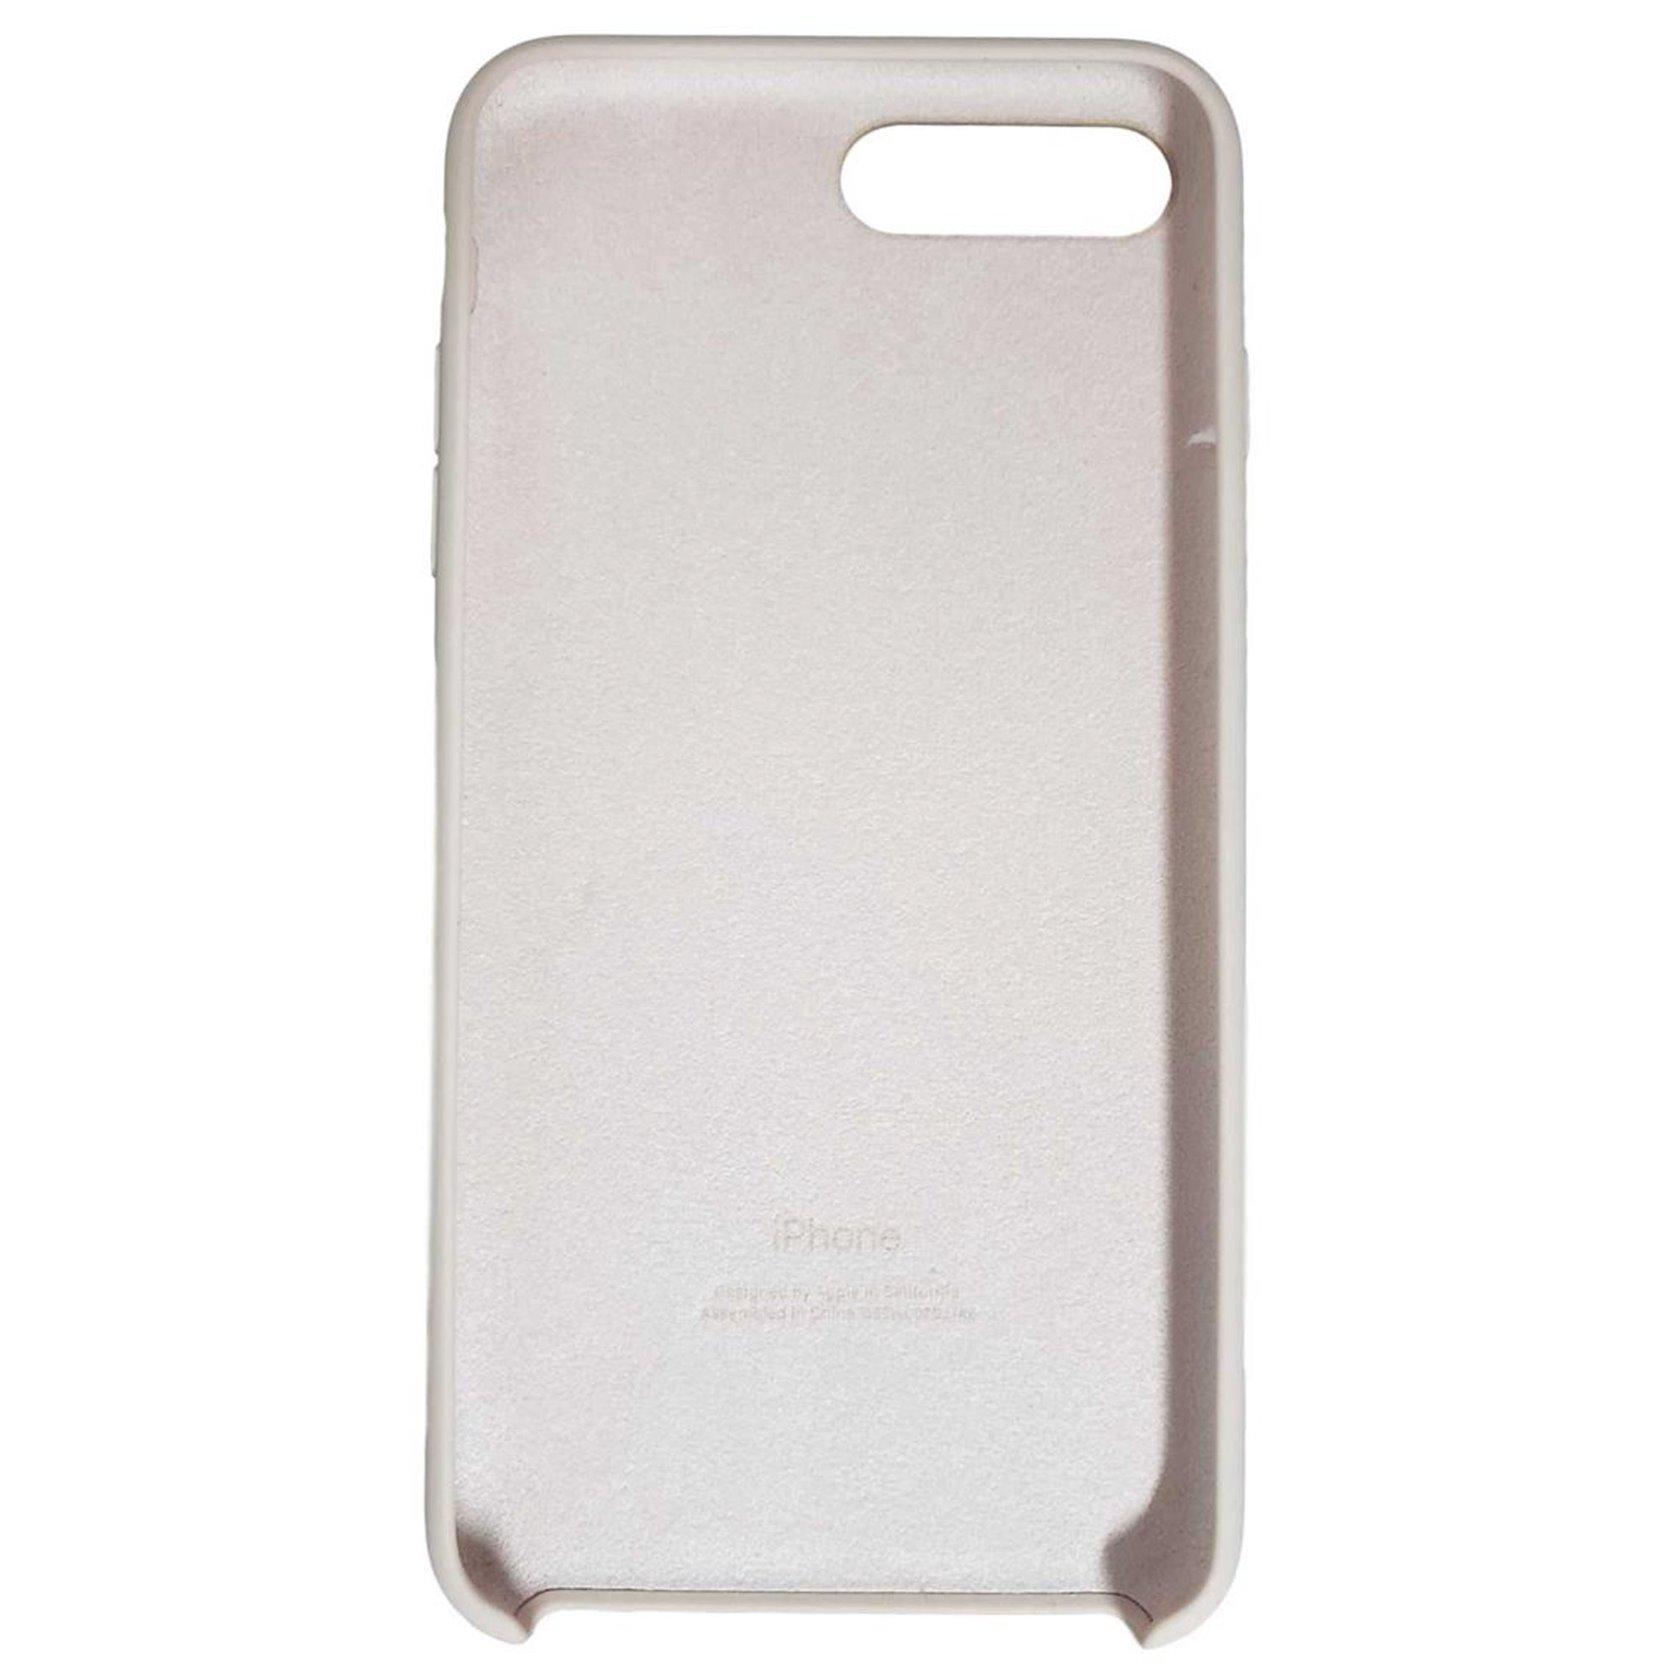 Çexol Silicone Case Apple iPhone 8 Plus / 7 Plus üçün Pink Sand